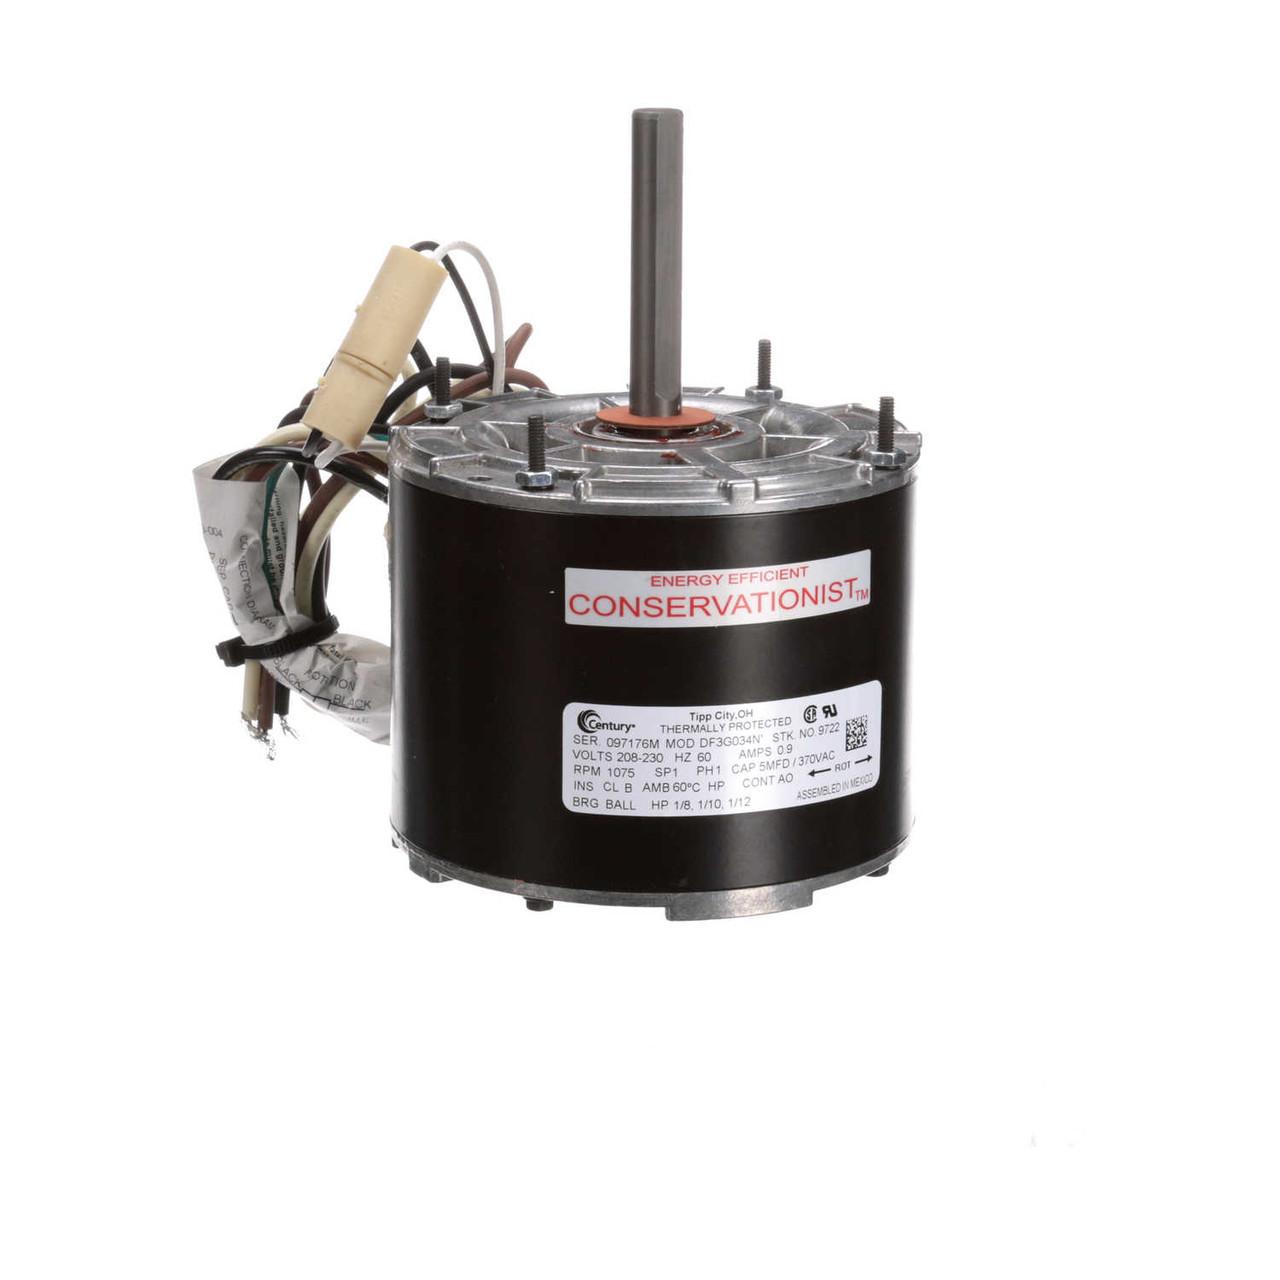 230 Motor Wiring Diagrams As Well Intermatic Pool Timer Wiring Diagram